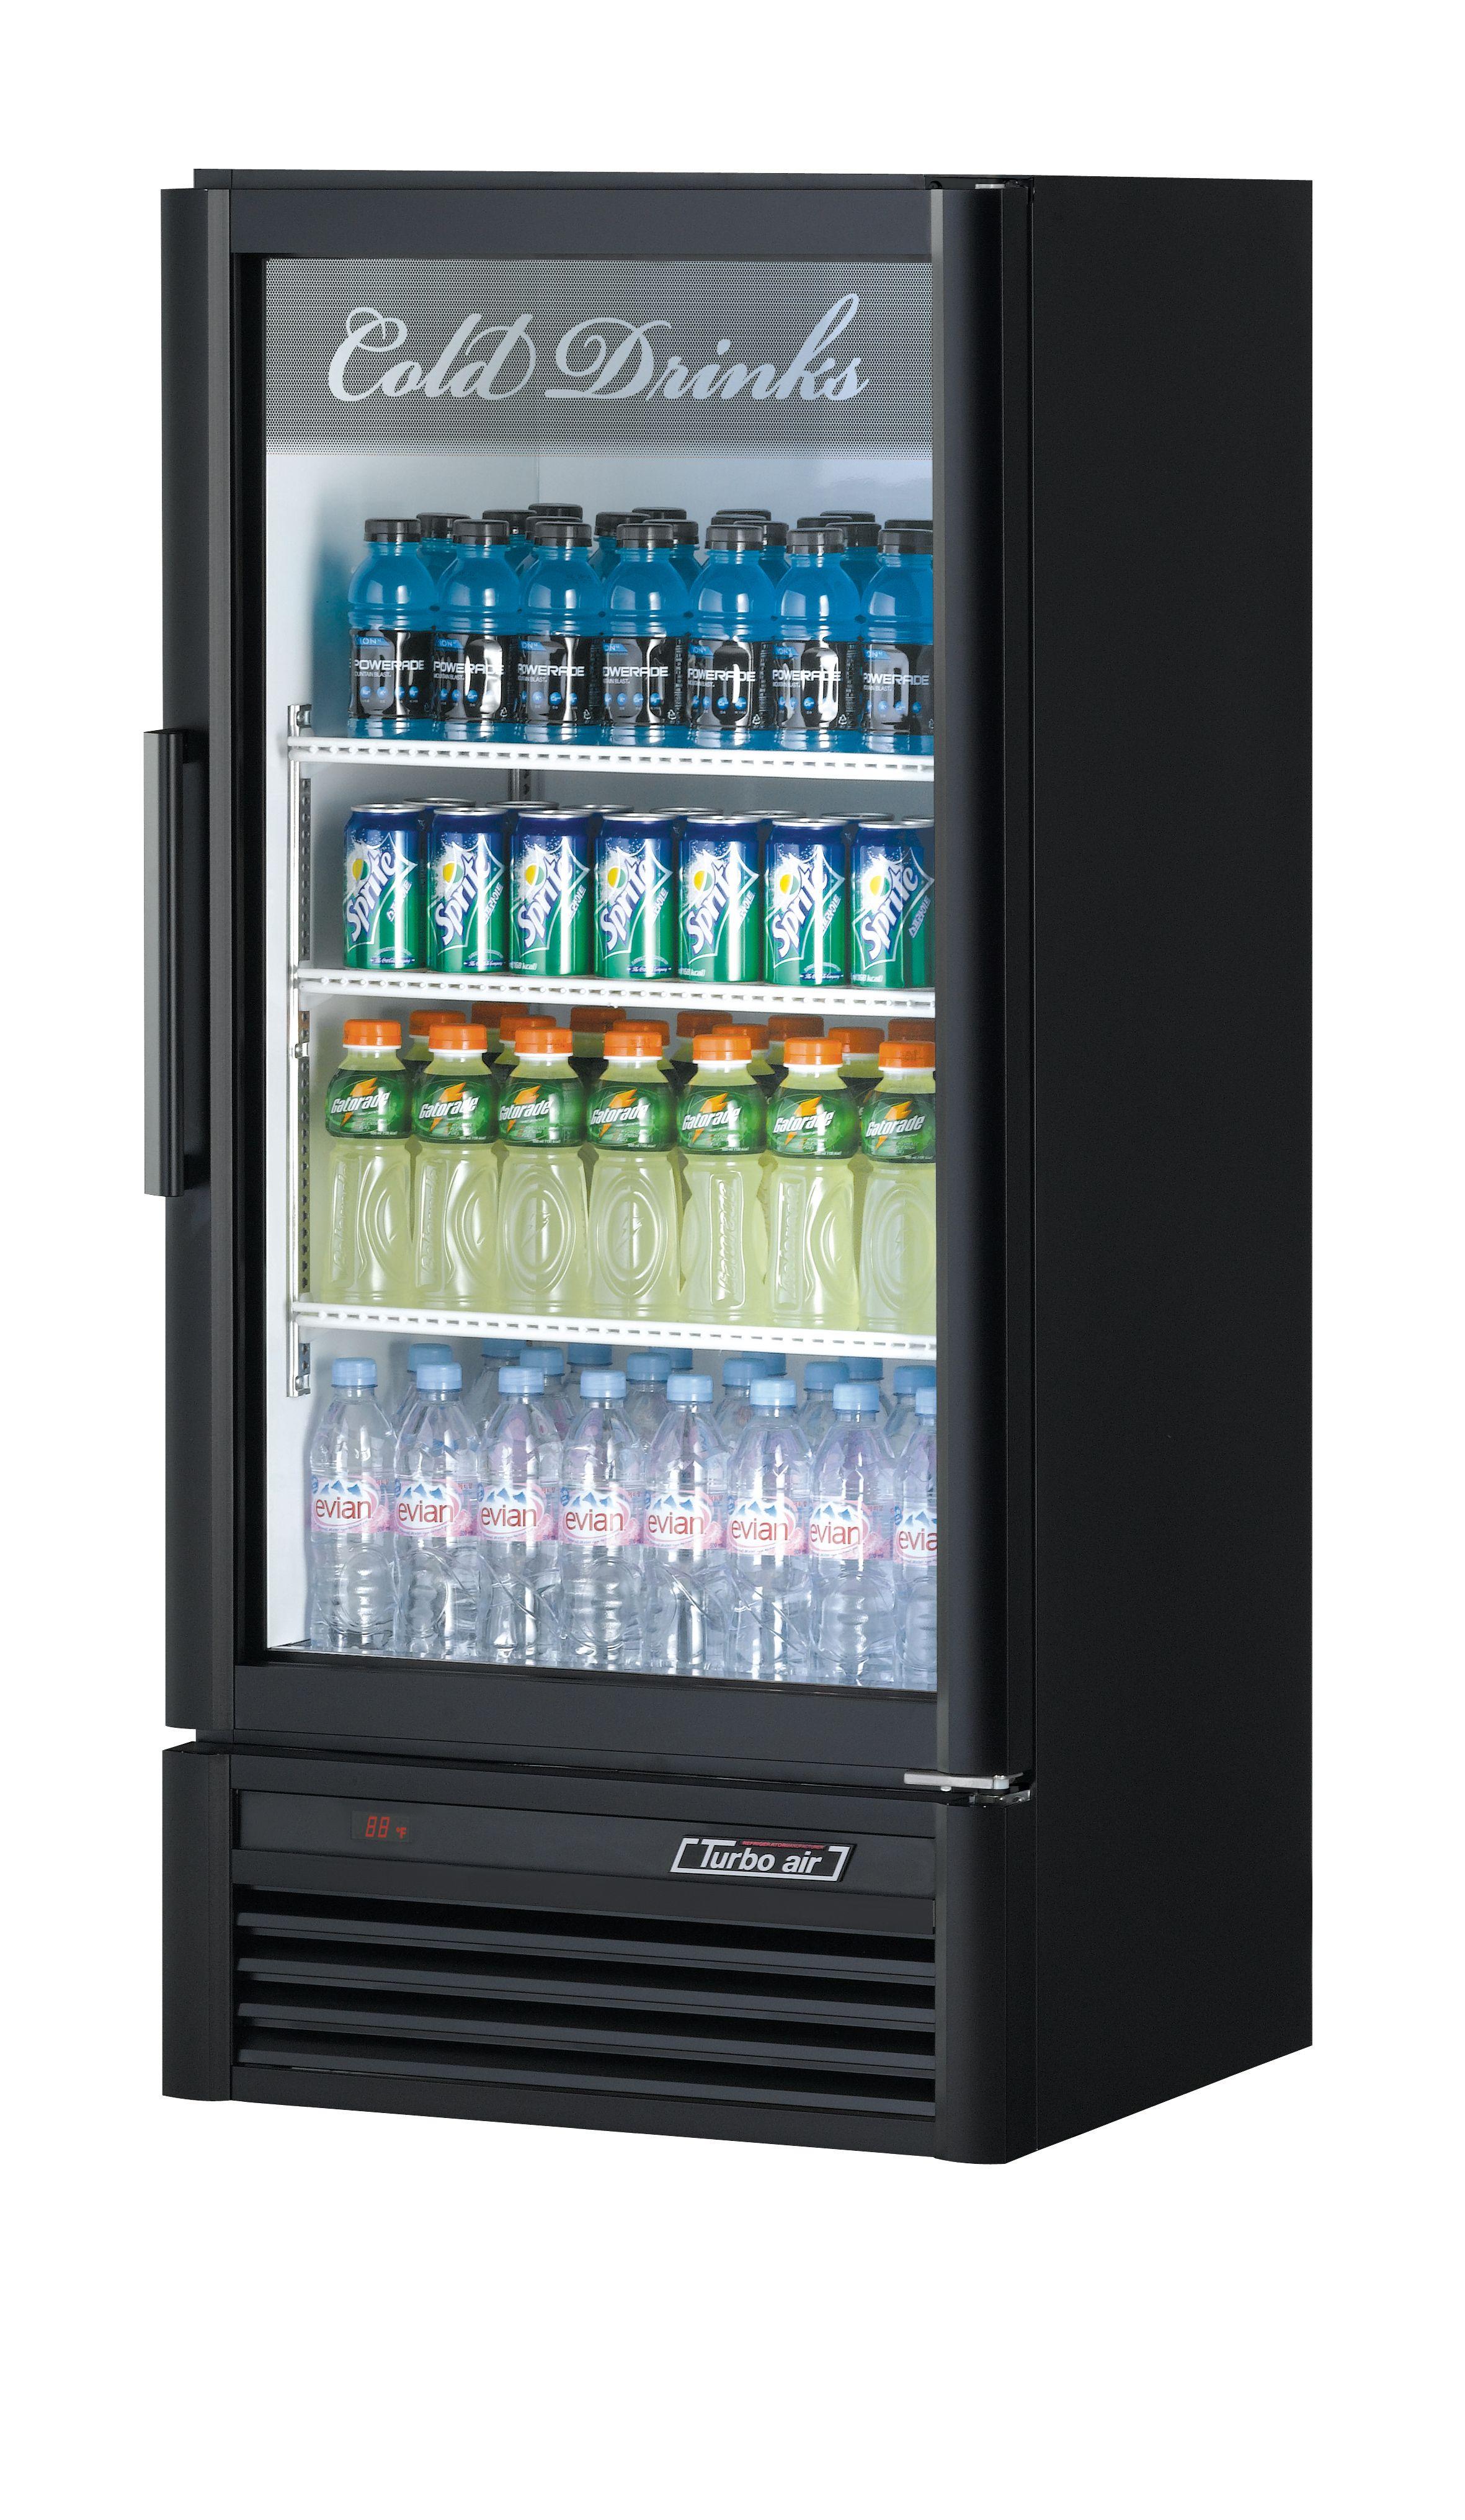 Refrigerator 9.3 Cu. Ft., 1 Swing Door // Refrigerador 9.3